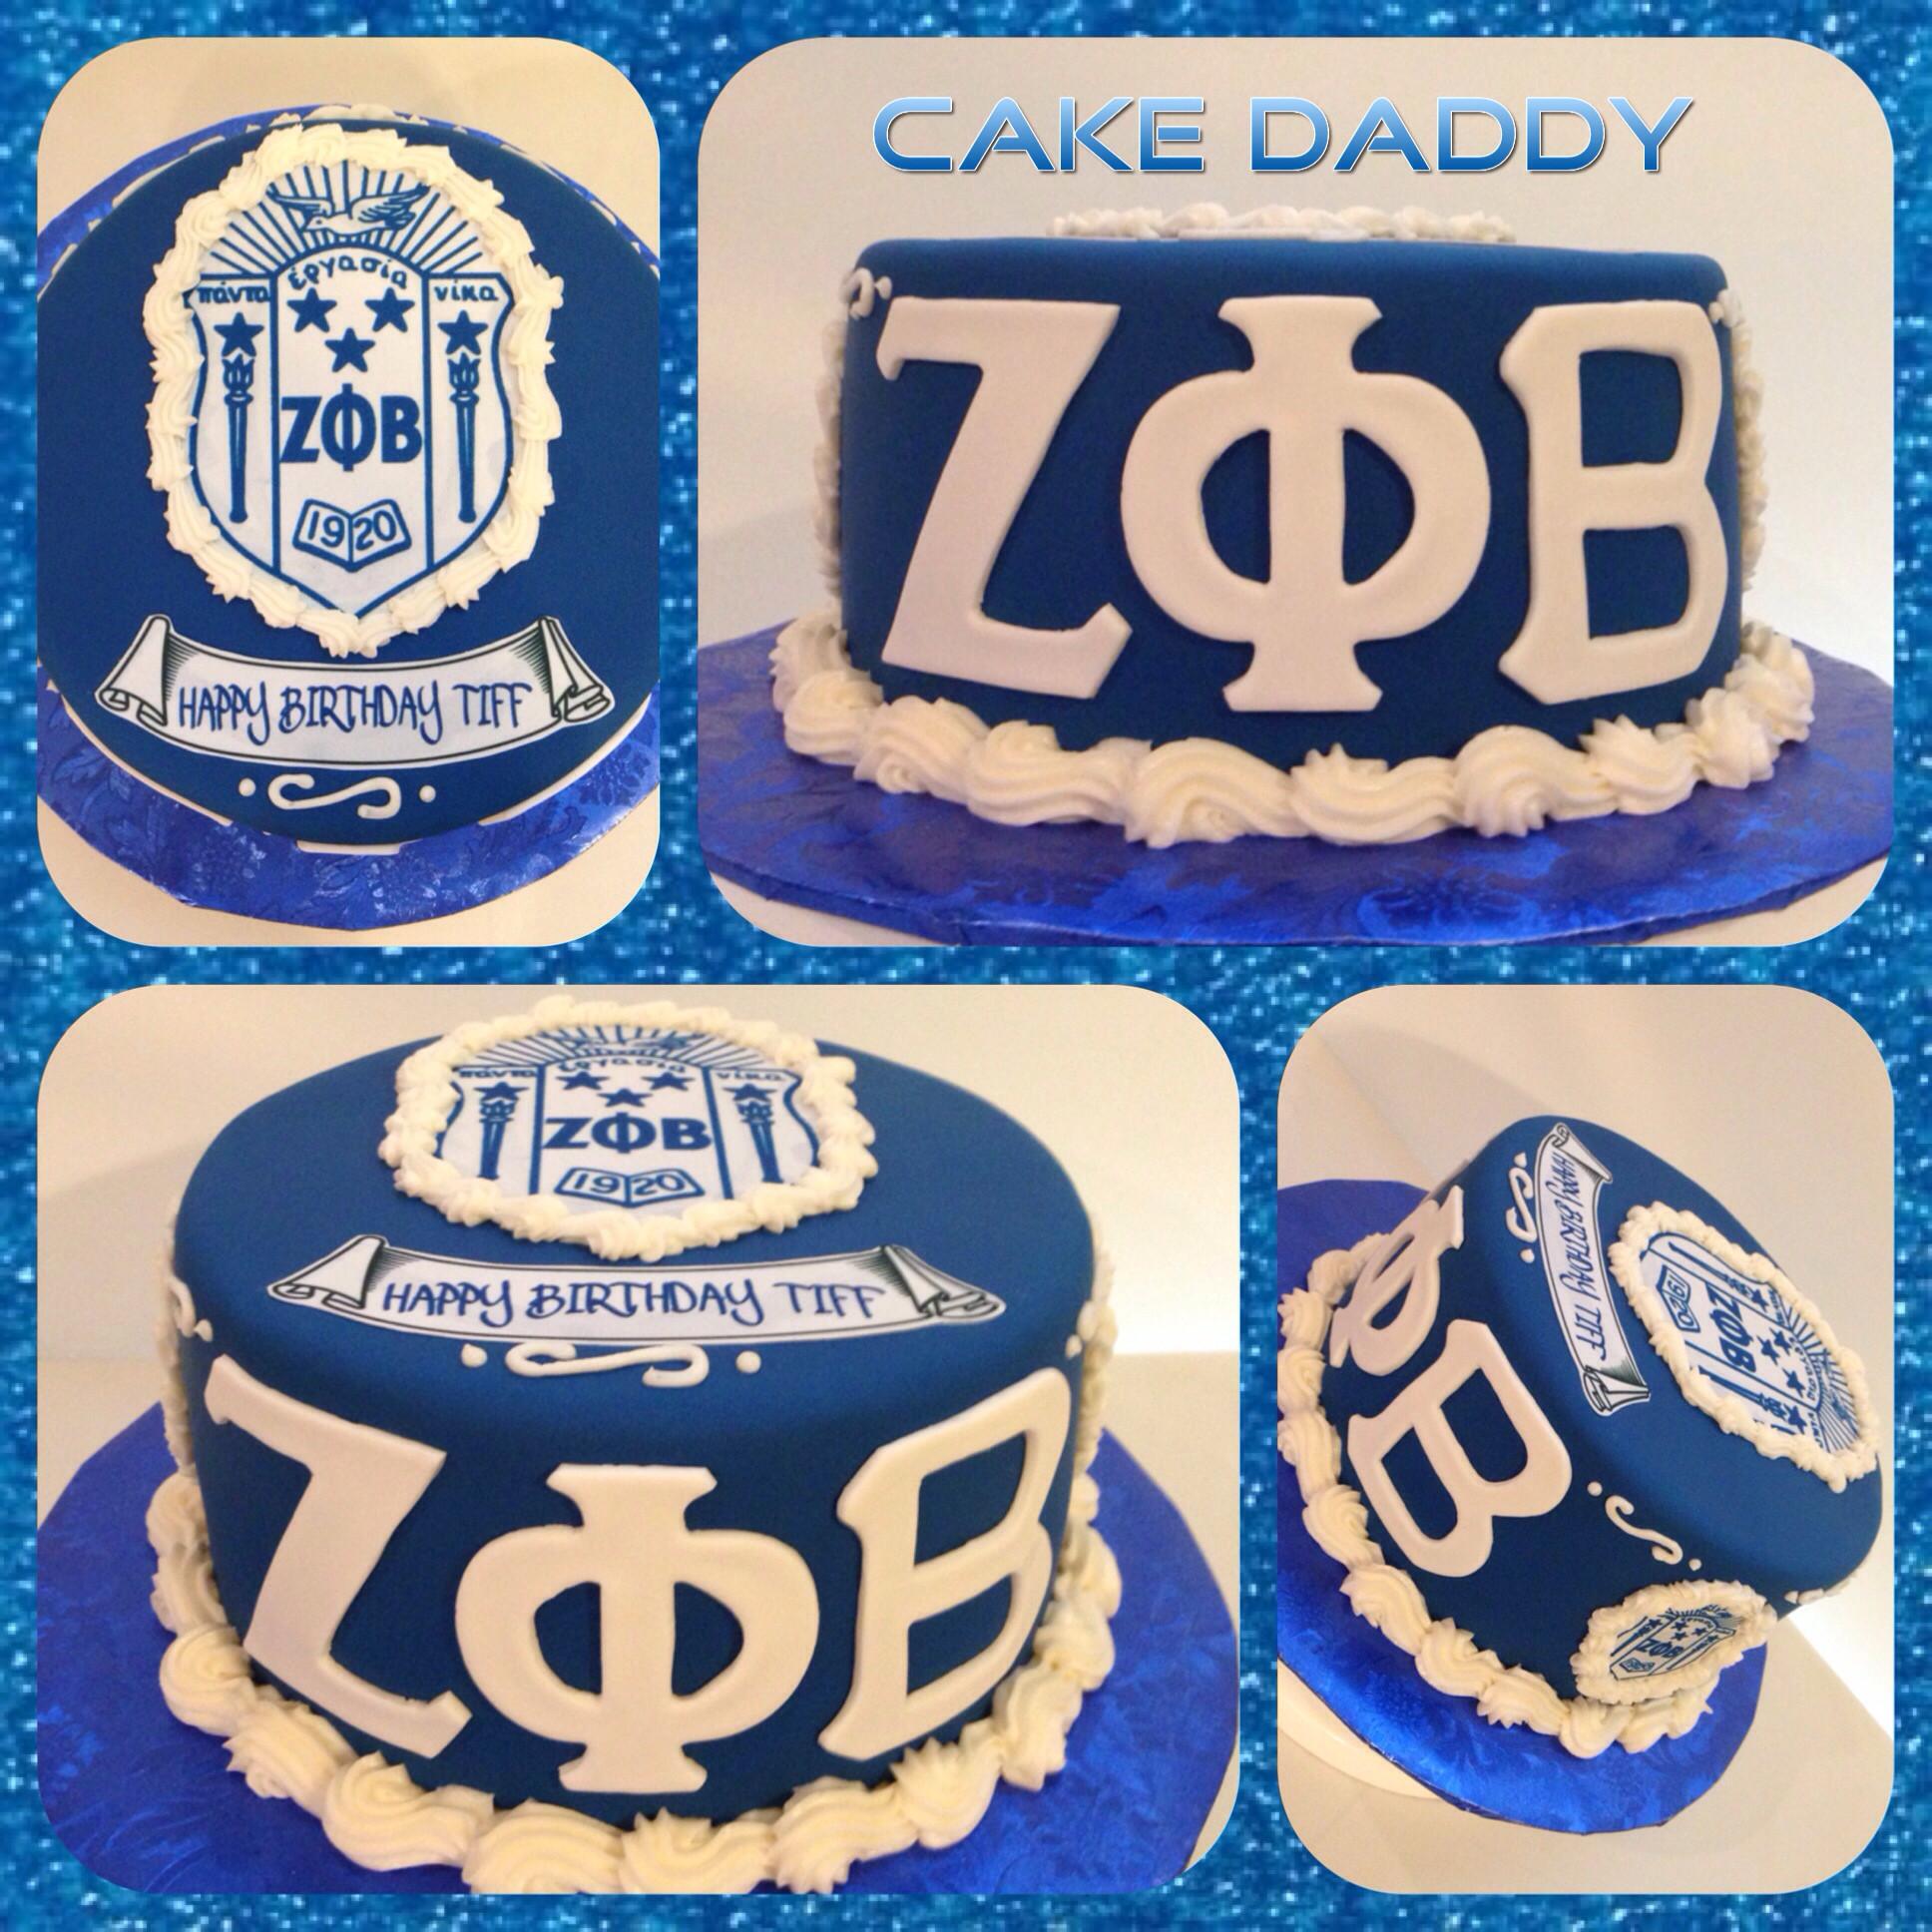 Zeta Phi Beta birthday cake